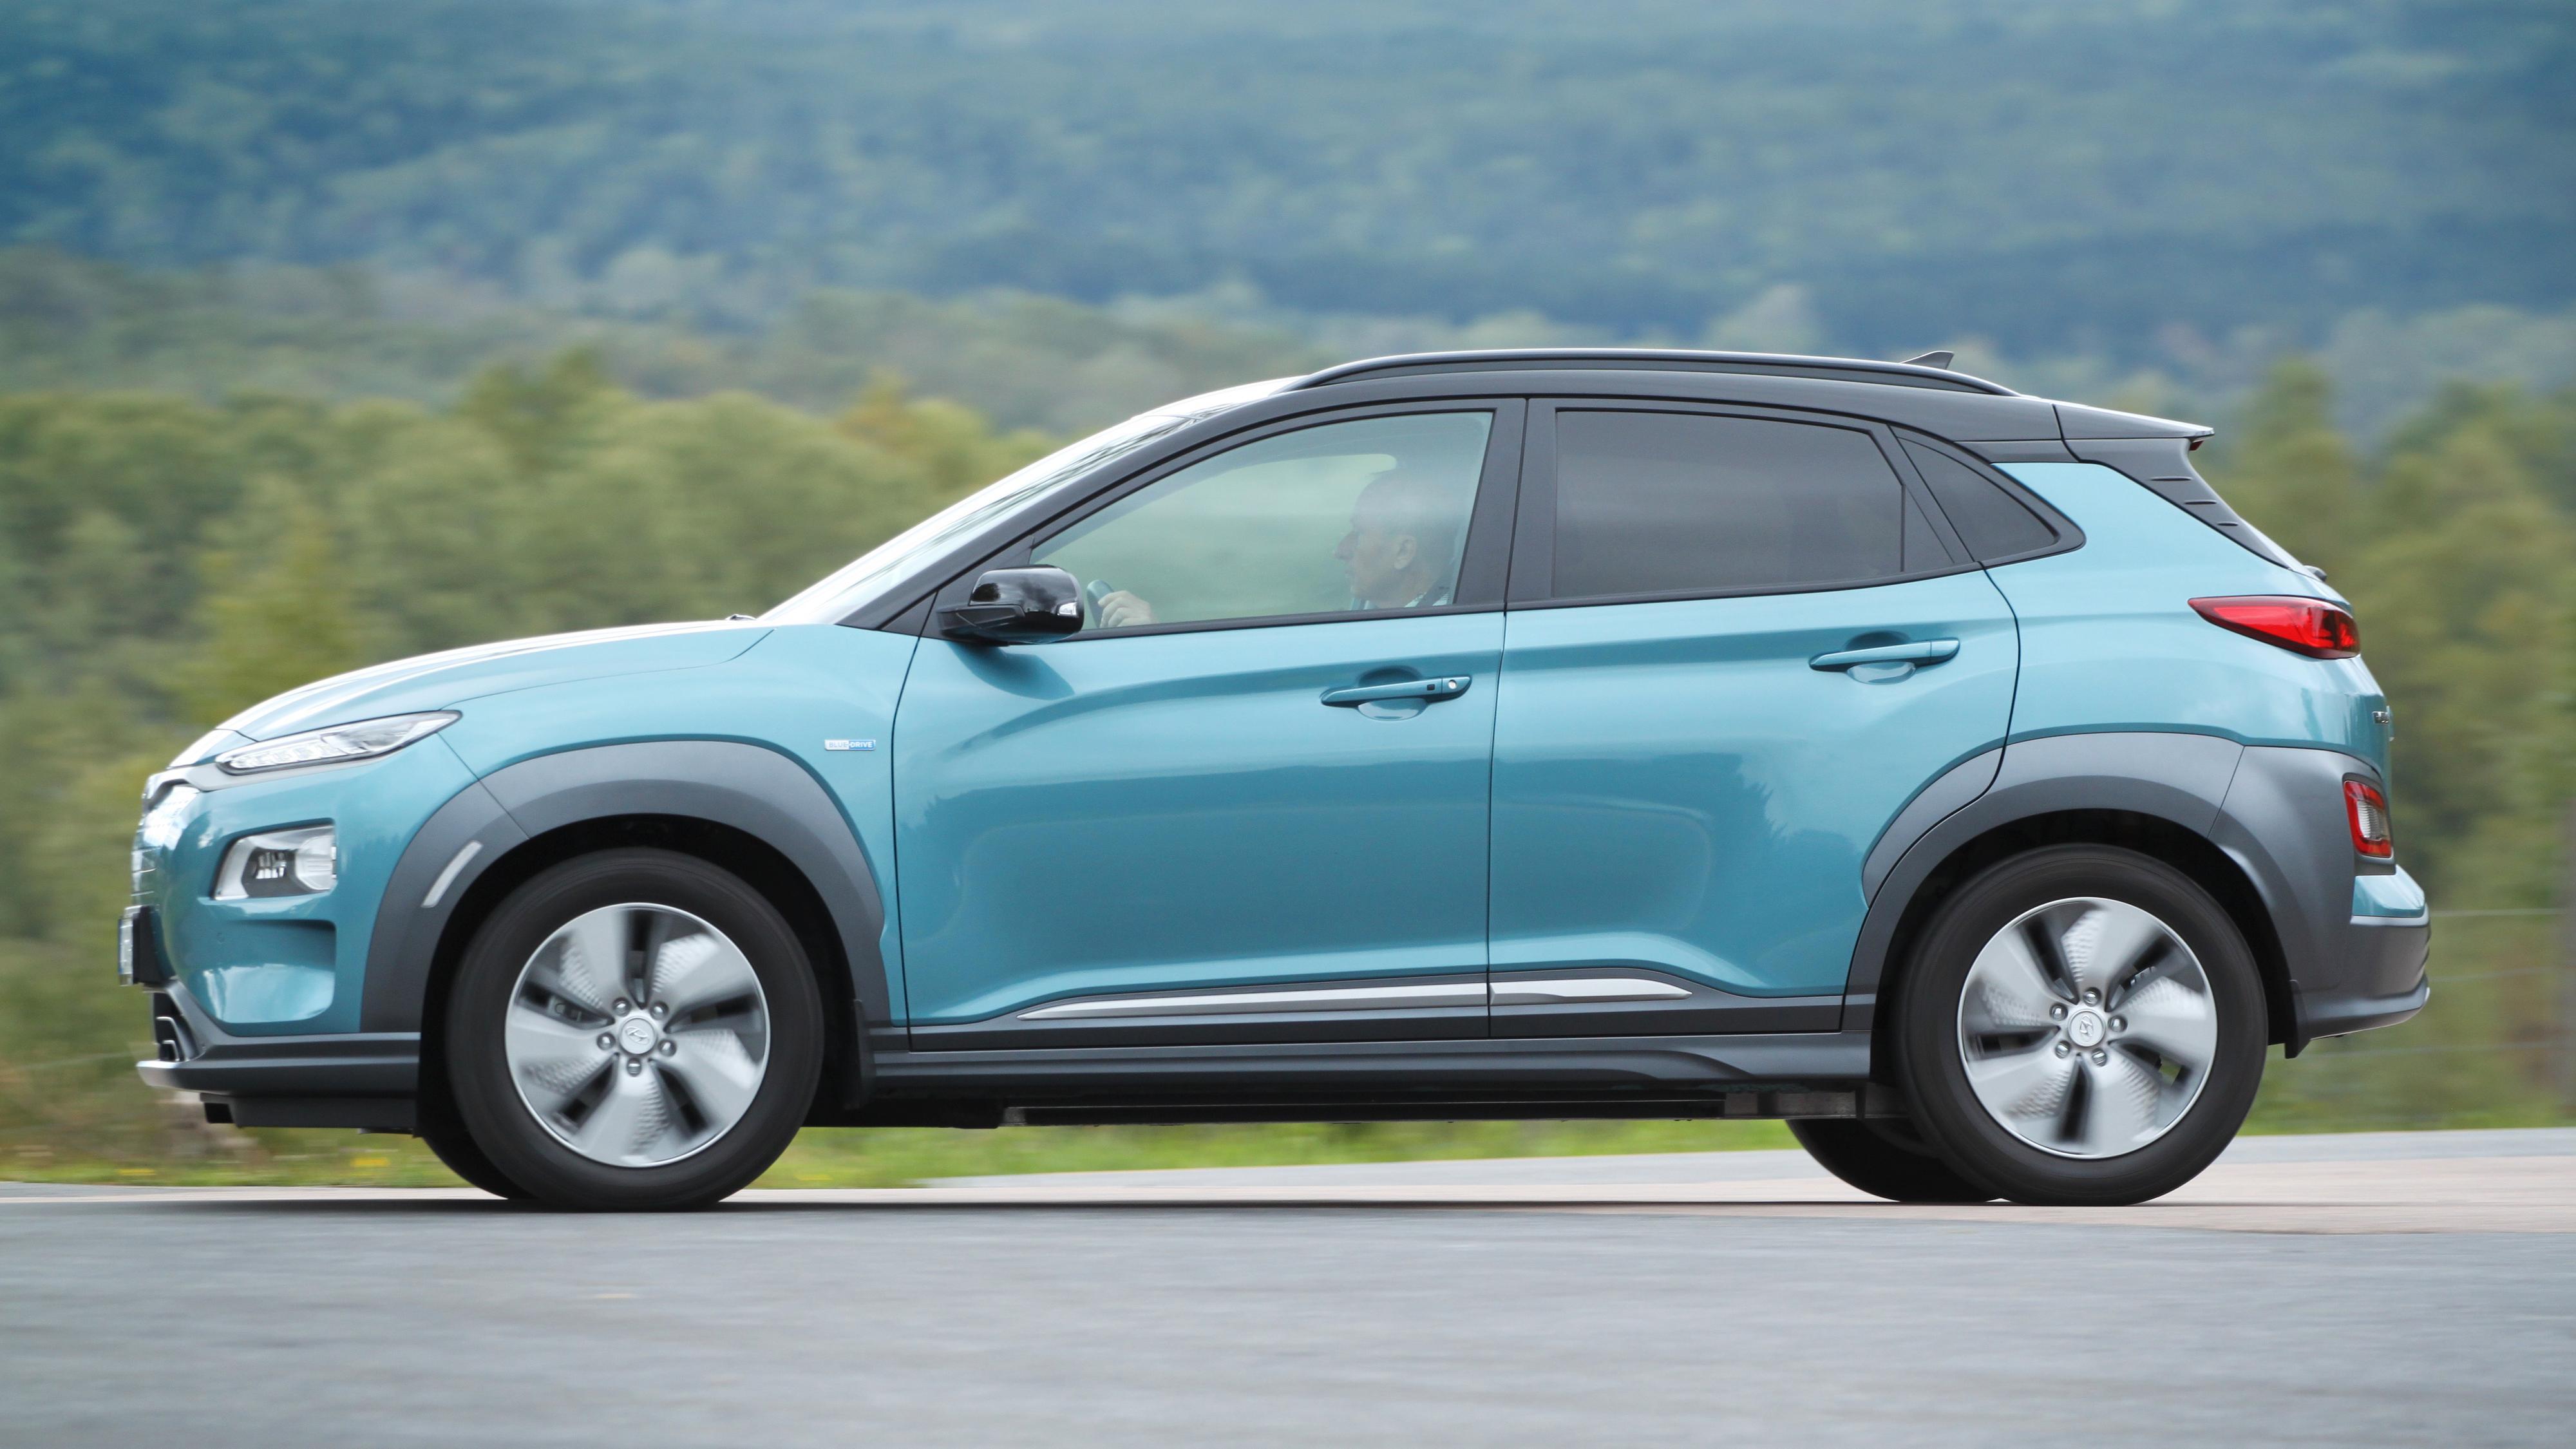 Hyundai lanserer billigere Kona, varsler kortere leveringstid